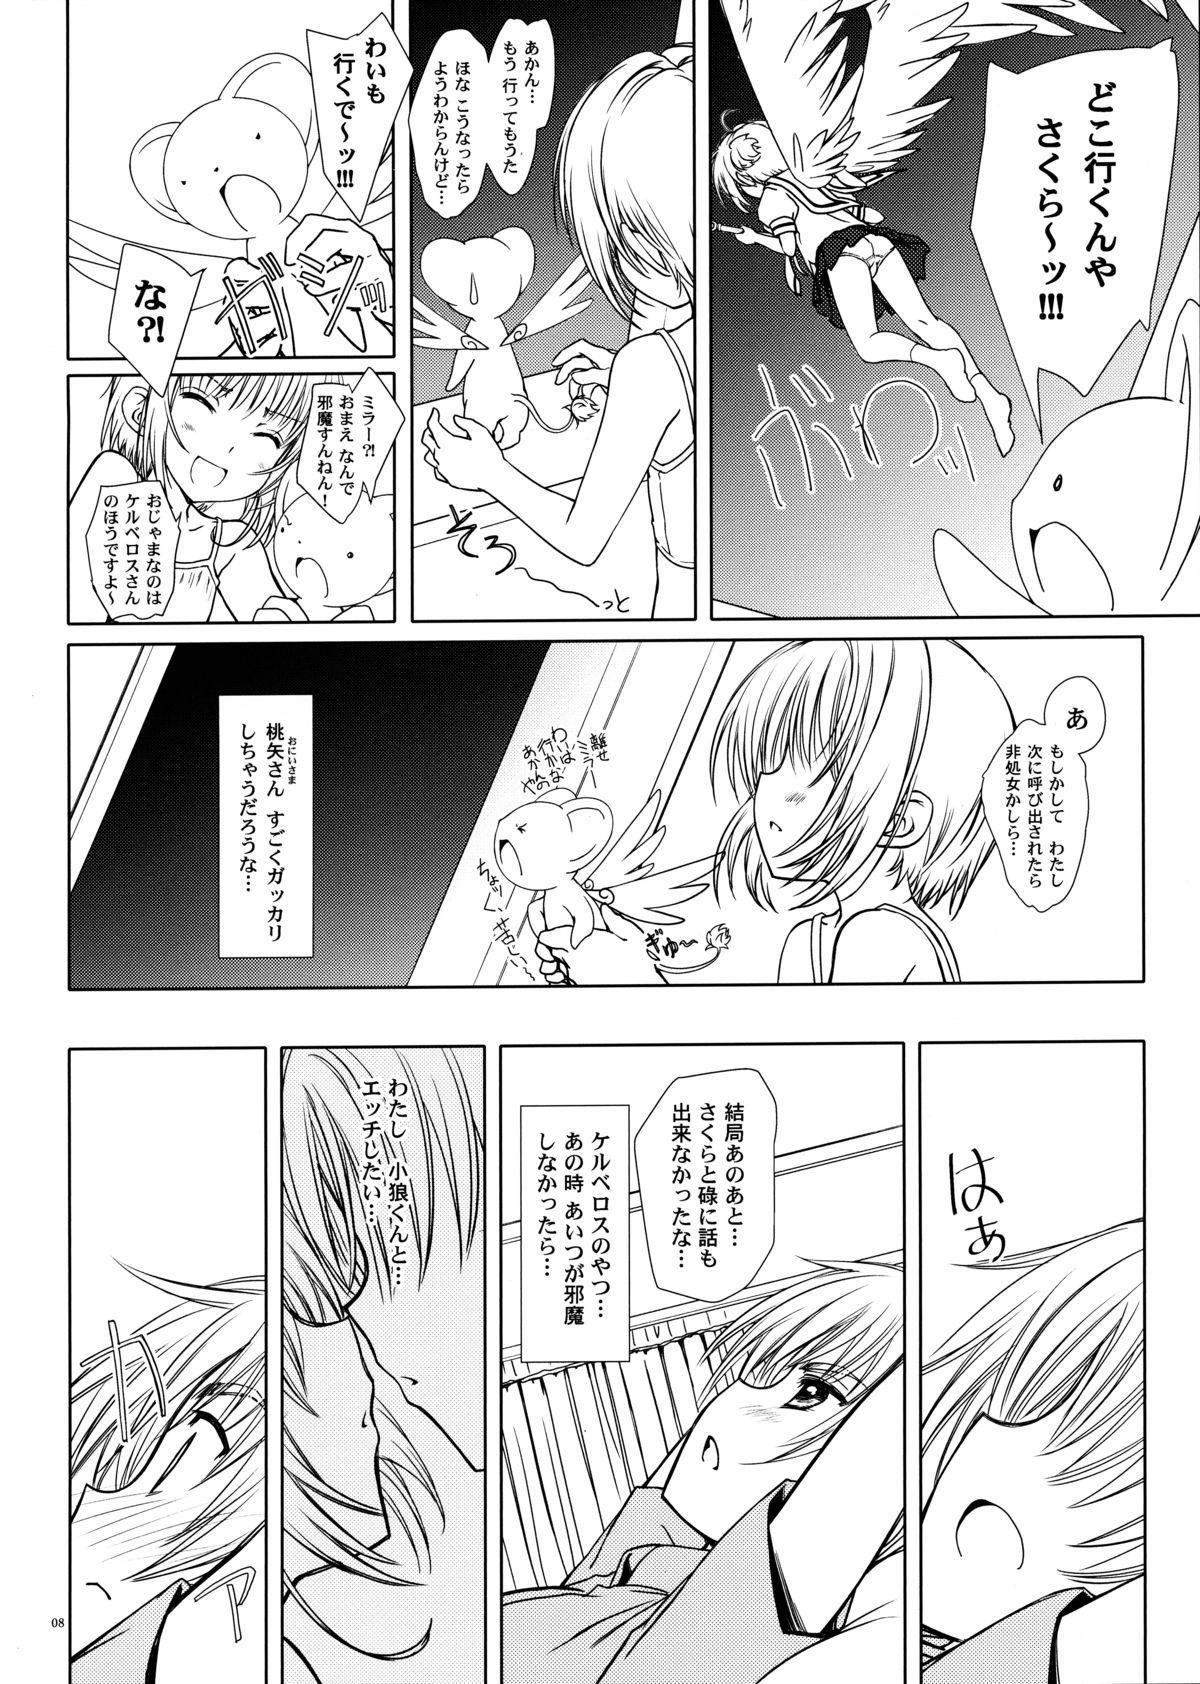 Magic of Love 6